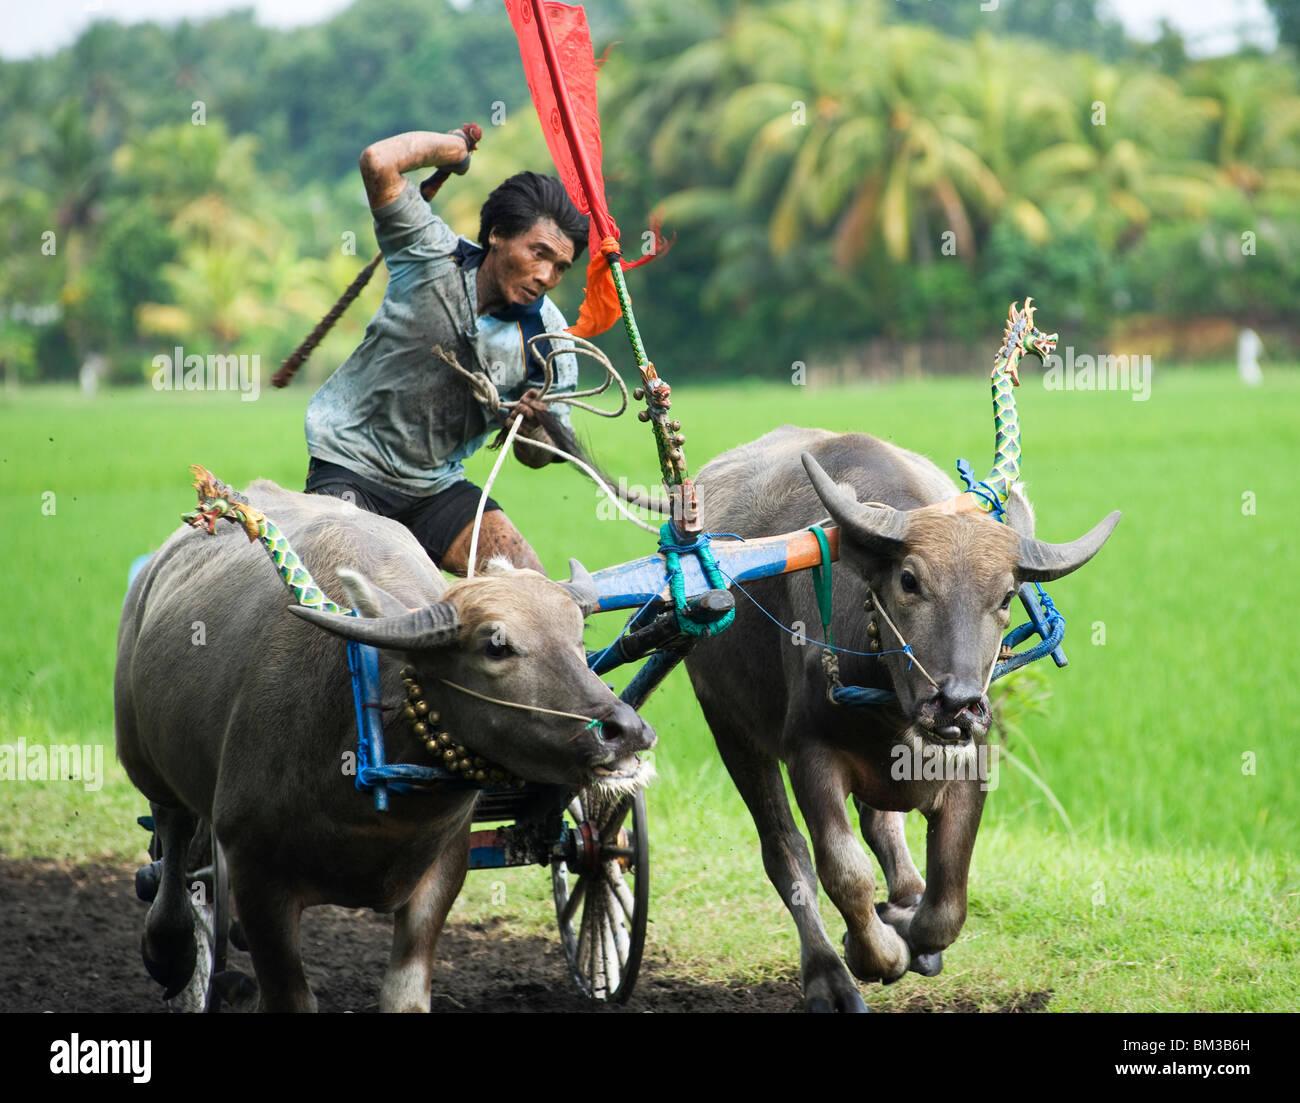 Perancak Bali, practicing for buffalo races, Indonesia - Stock Image